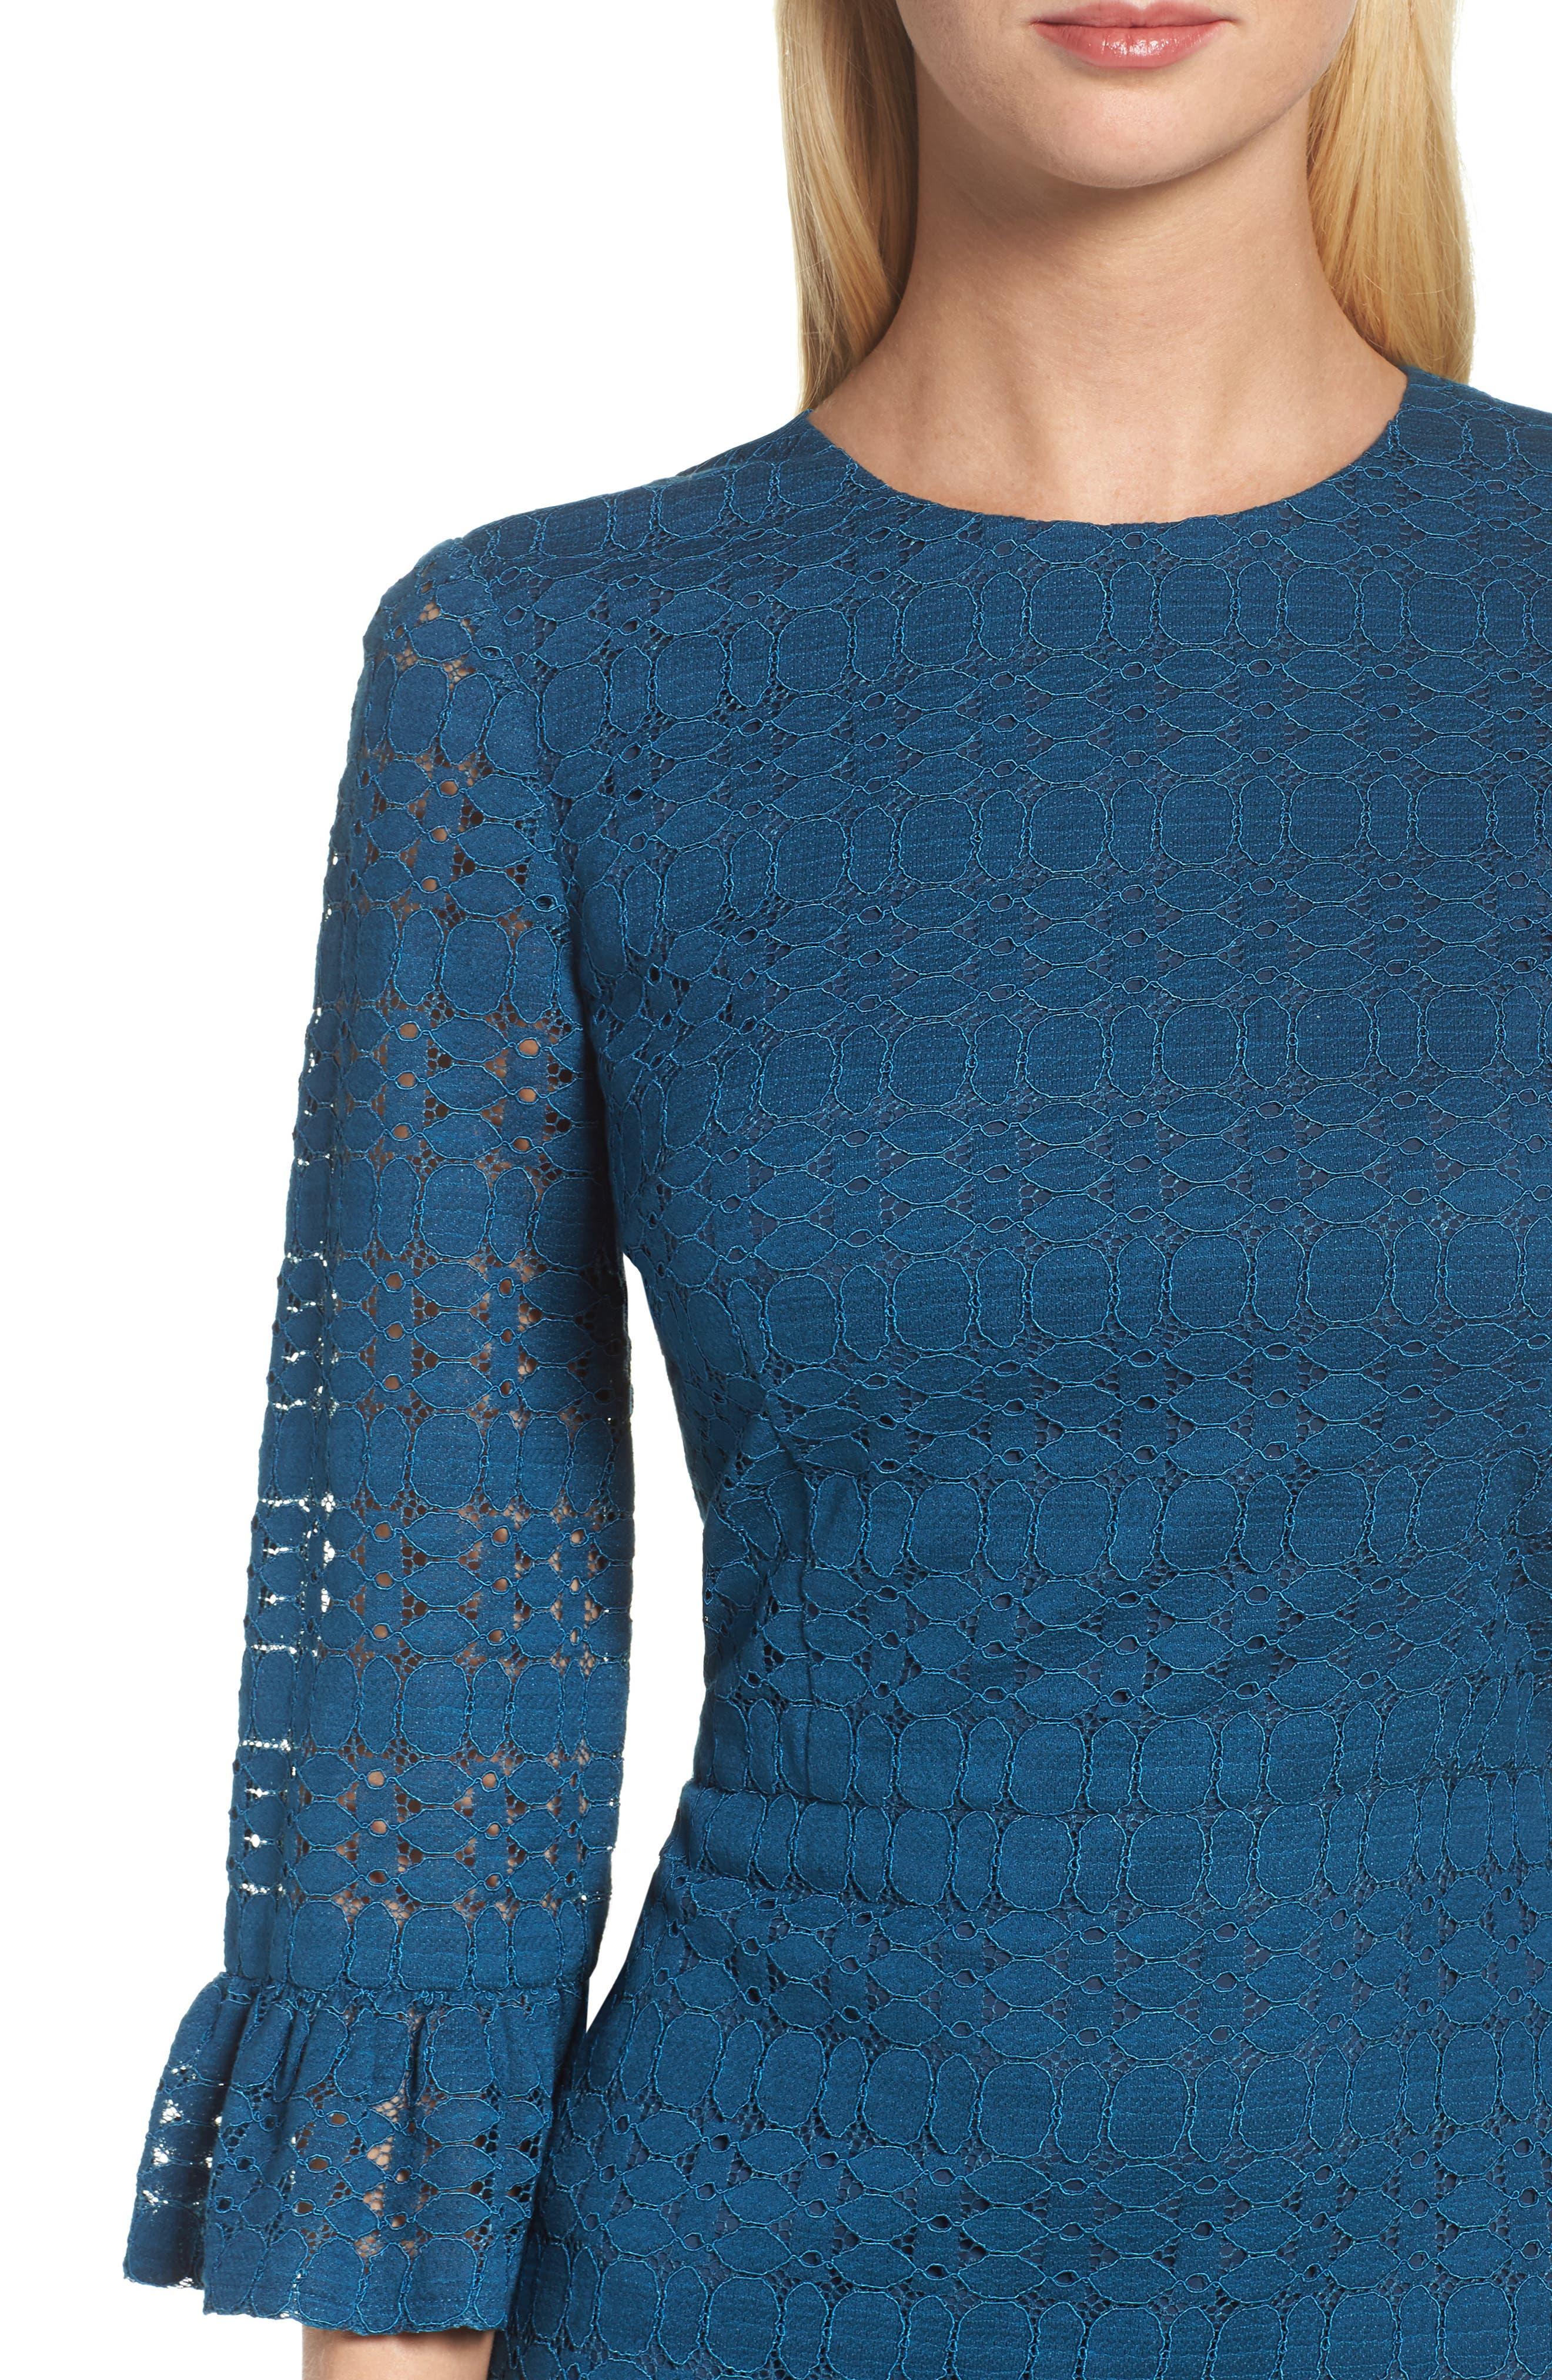 Ruffle Lace Sheath Dress,                             Alternate thumbnail 4, color,                             458